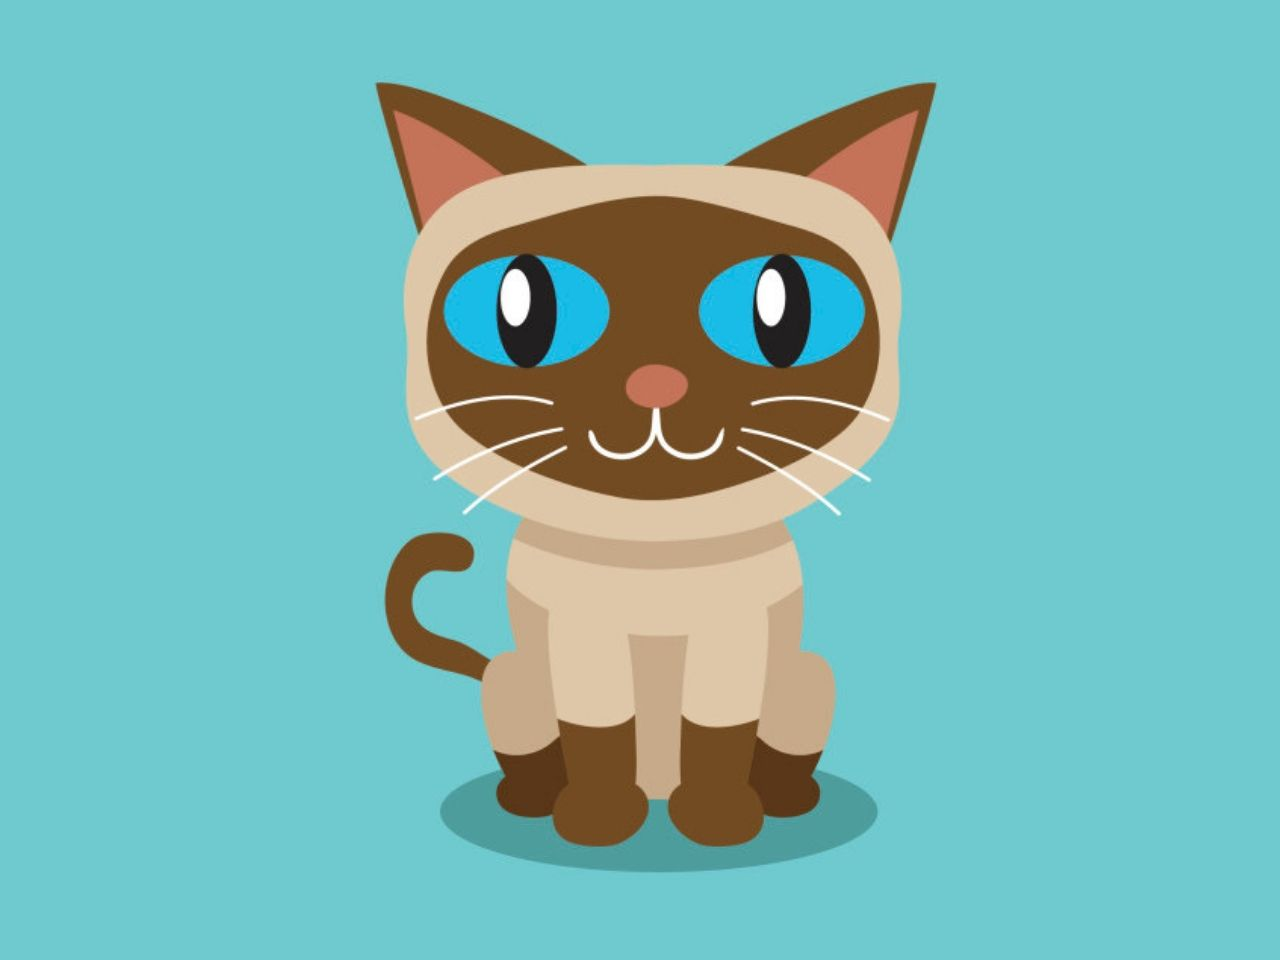 Comel Gambar Kucing Cute - Koleksi Gambar HD